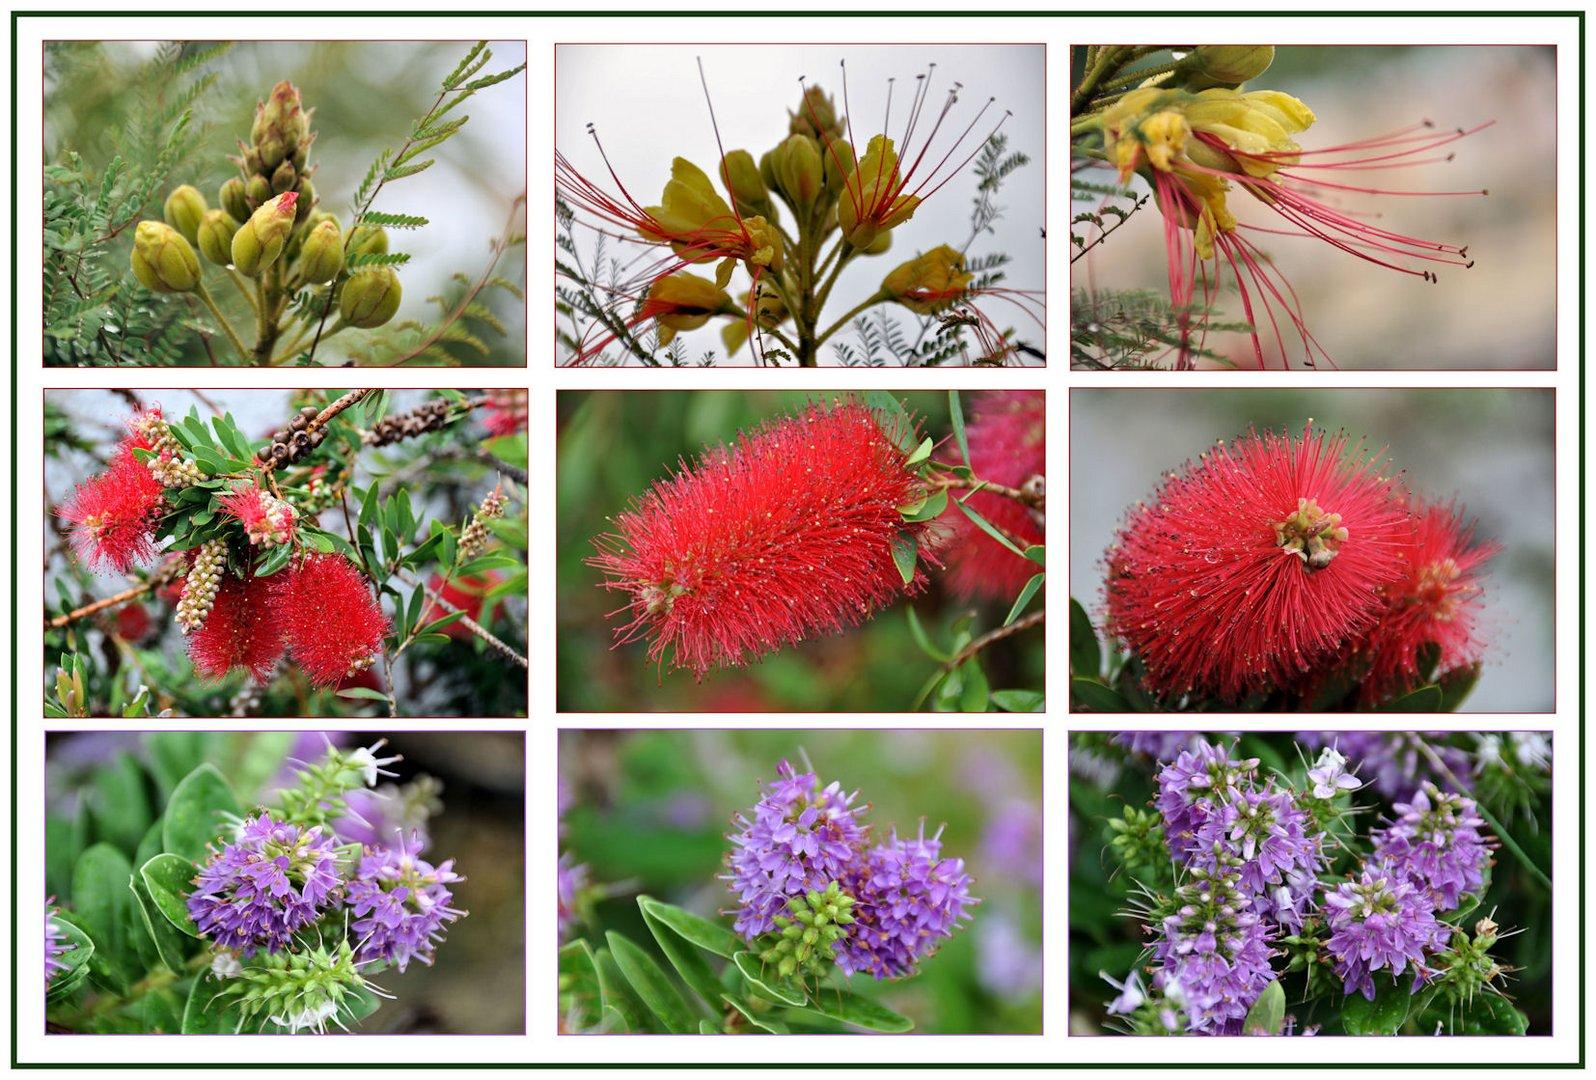 Blütensträucher...